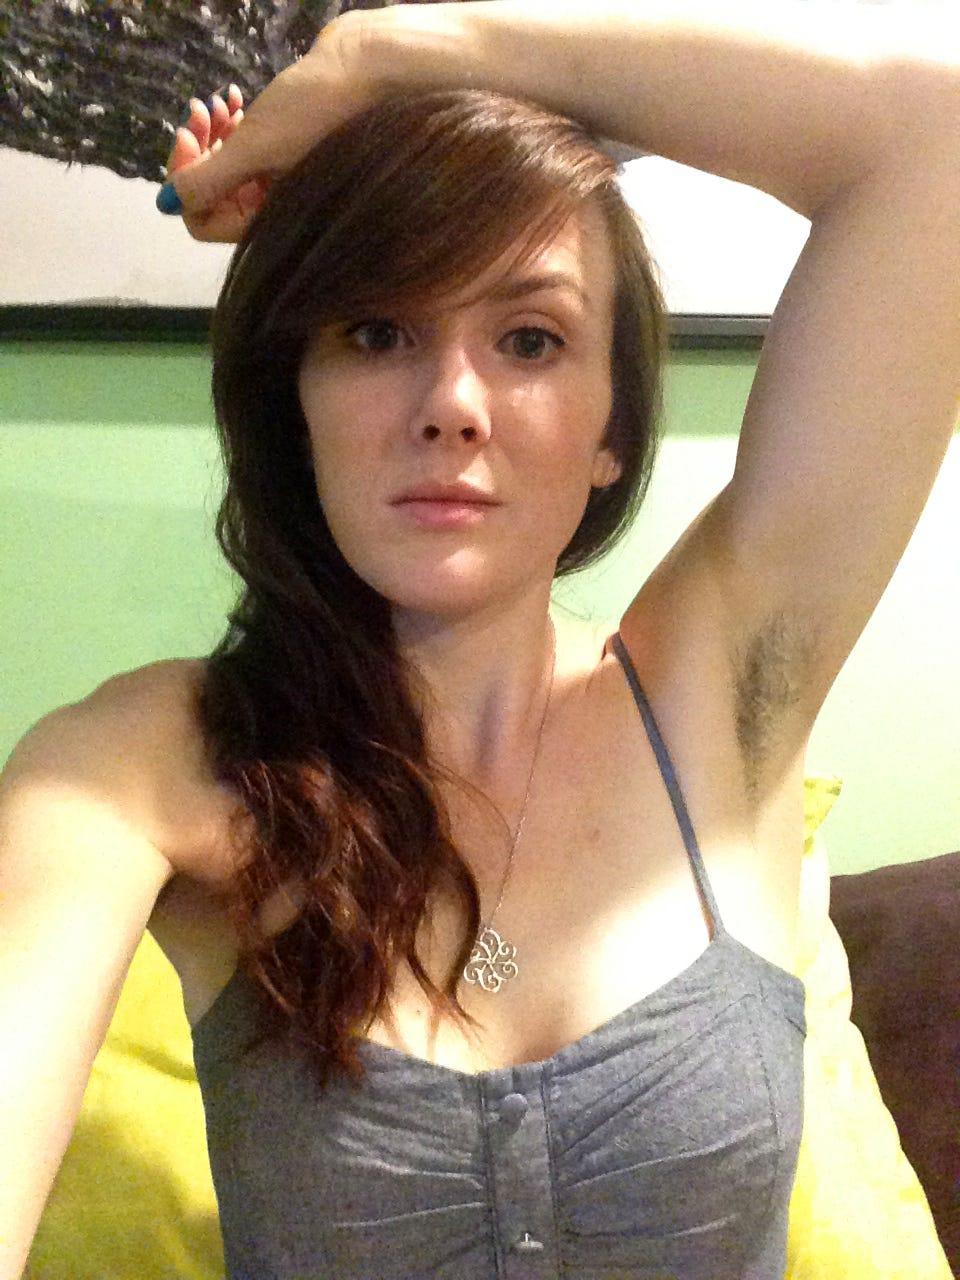 Selfie Laura Bella Evans nudes (69 photos), Ass, Sideboobs, Instagram, cameltoe 2017